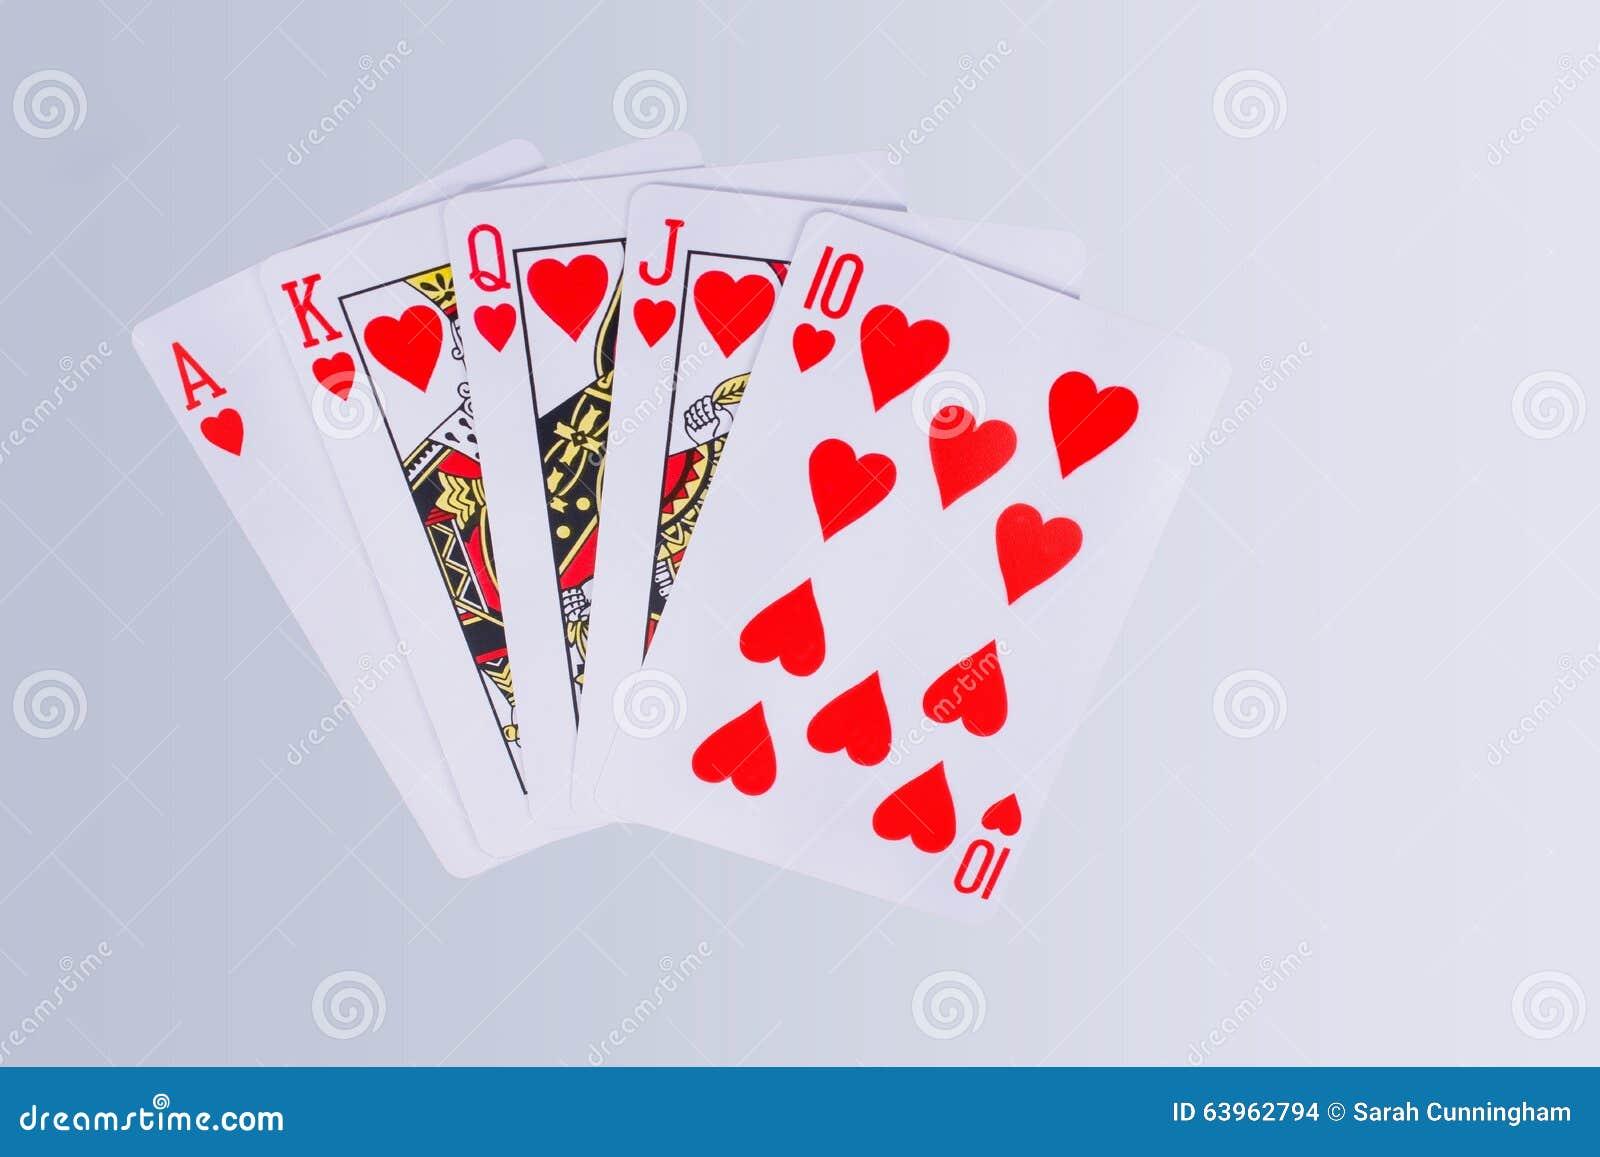 Poker j q k a 2